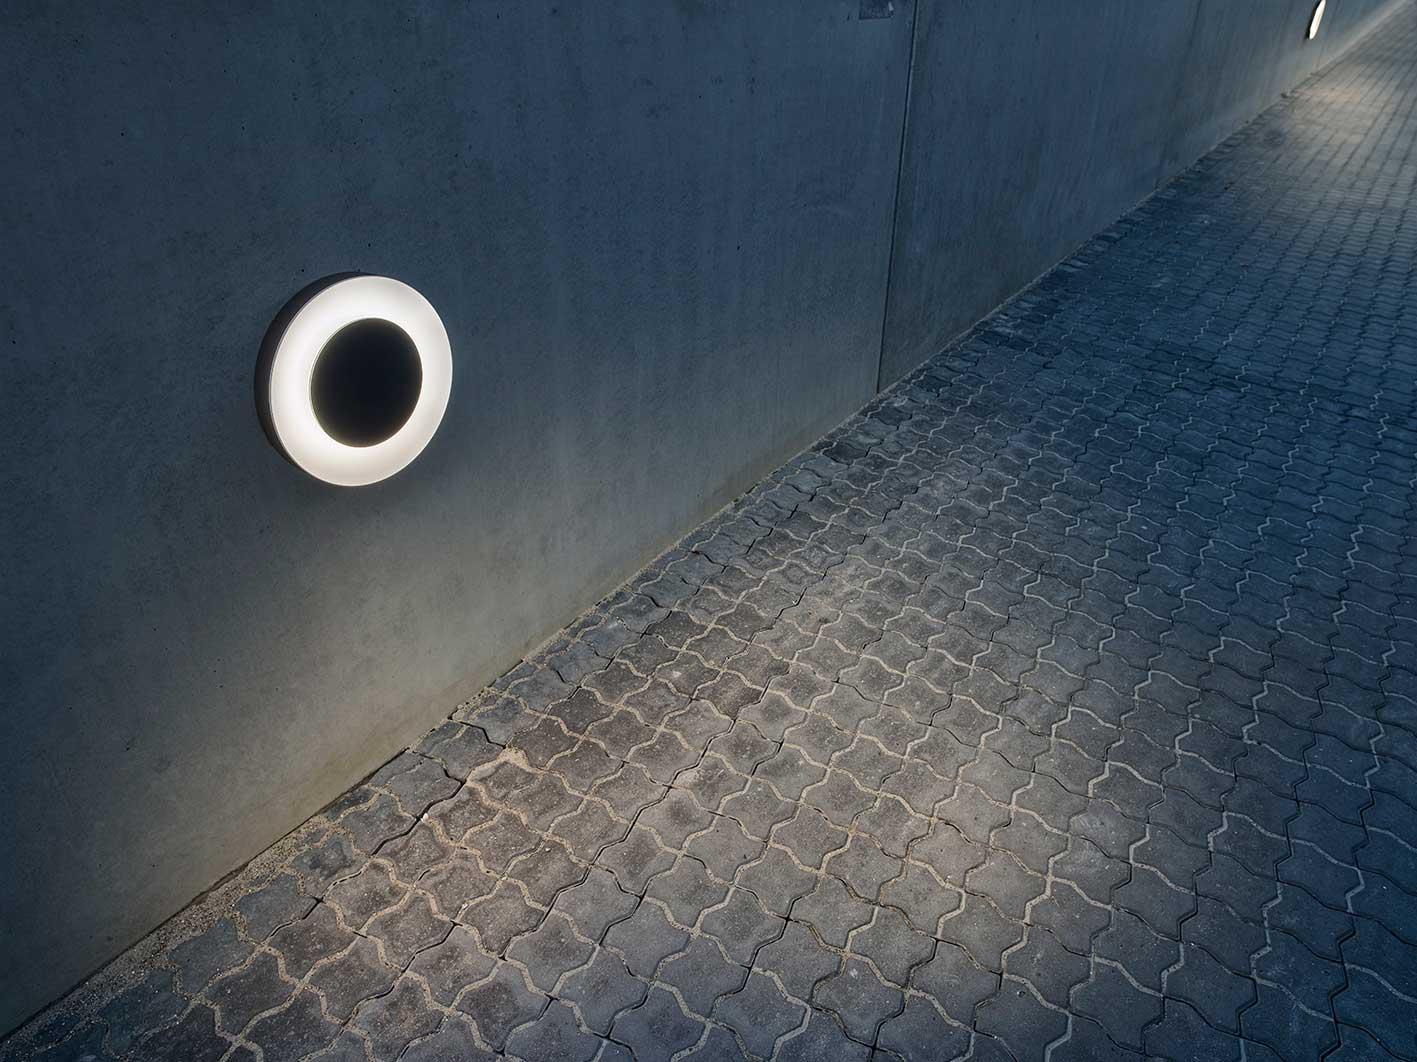 Ekleipsis monteret på væg langs de store områder ved bilhuset - Luminex